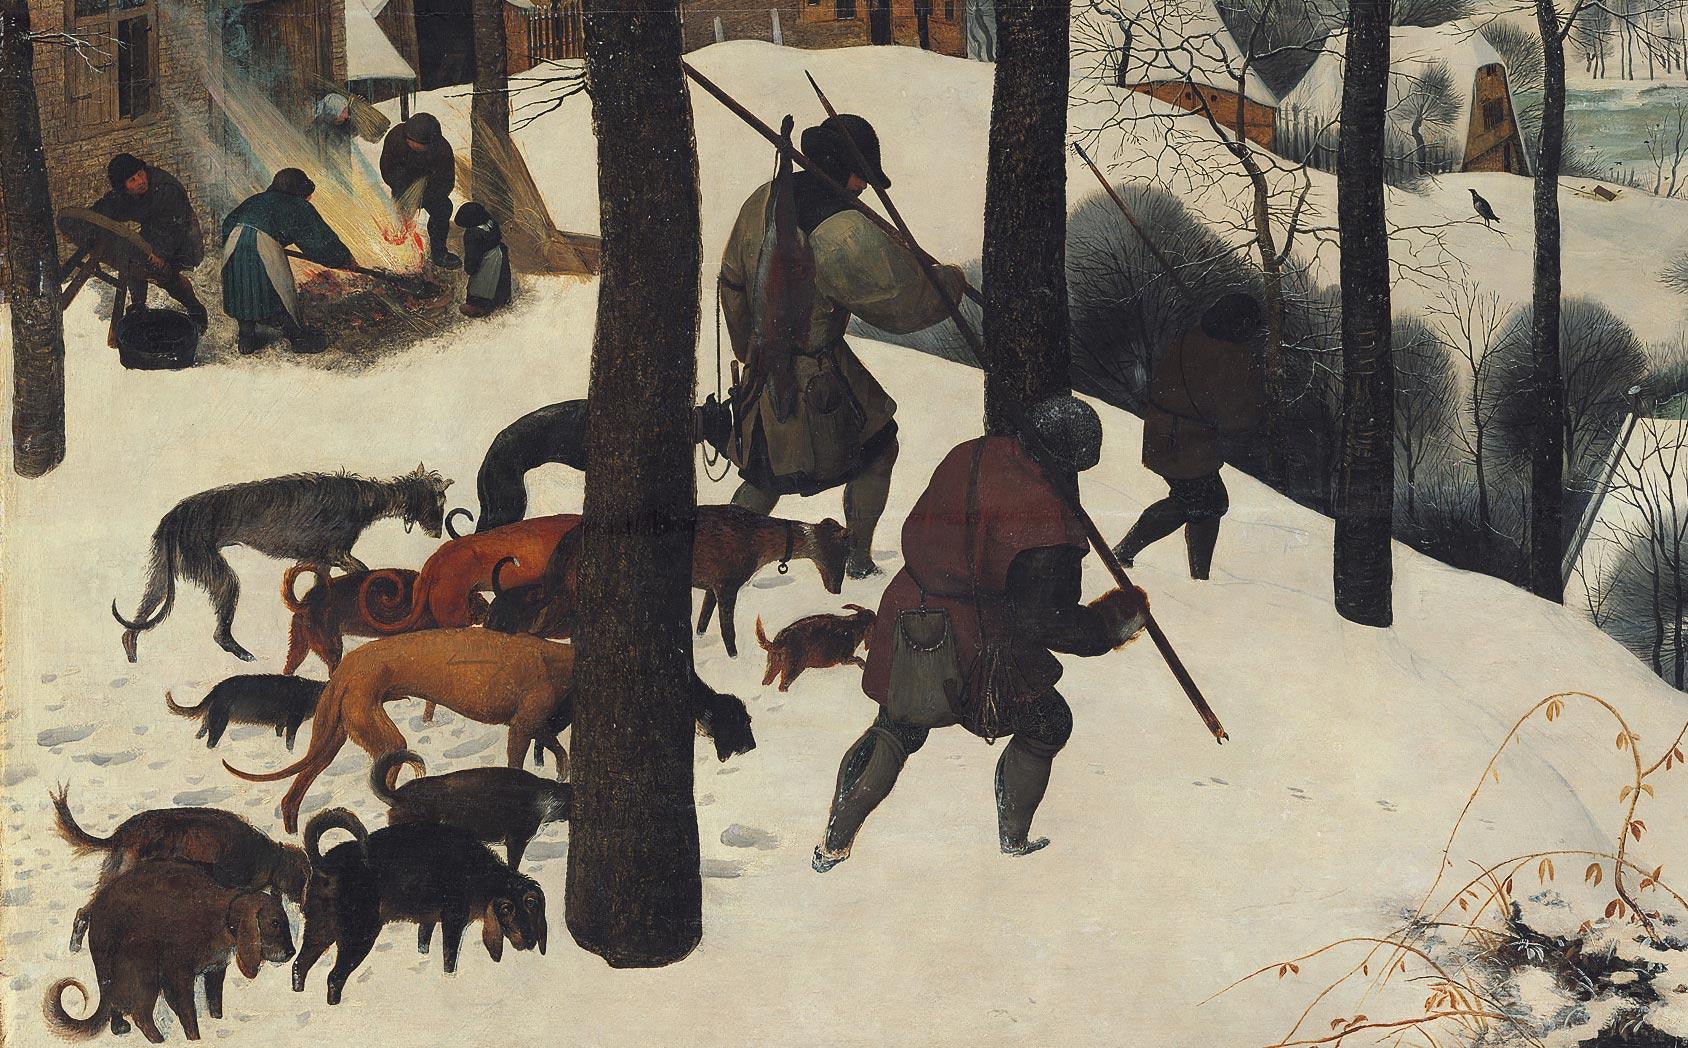 Pieter Bruegel, Cacciatori nella neve, dettaglio dei cacciatori